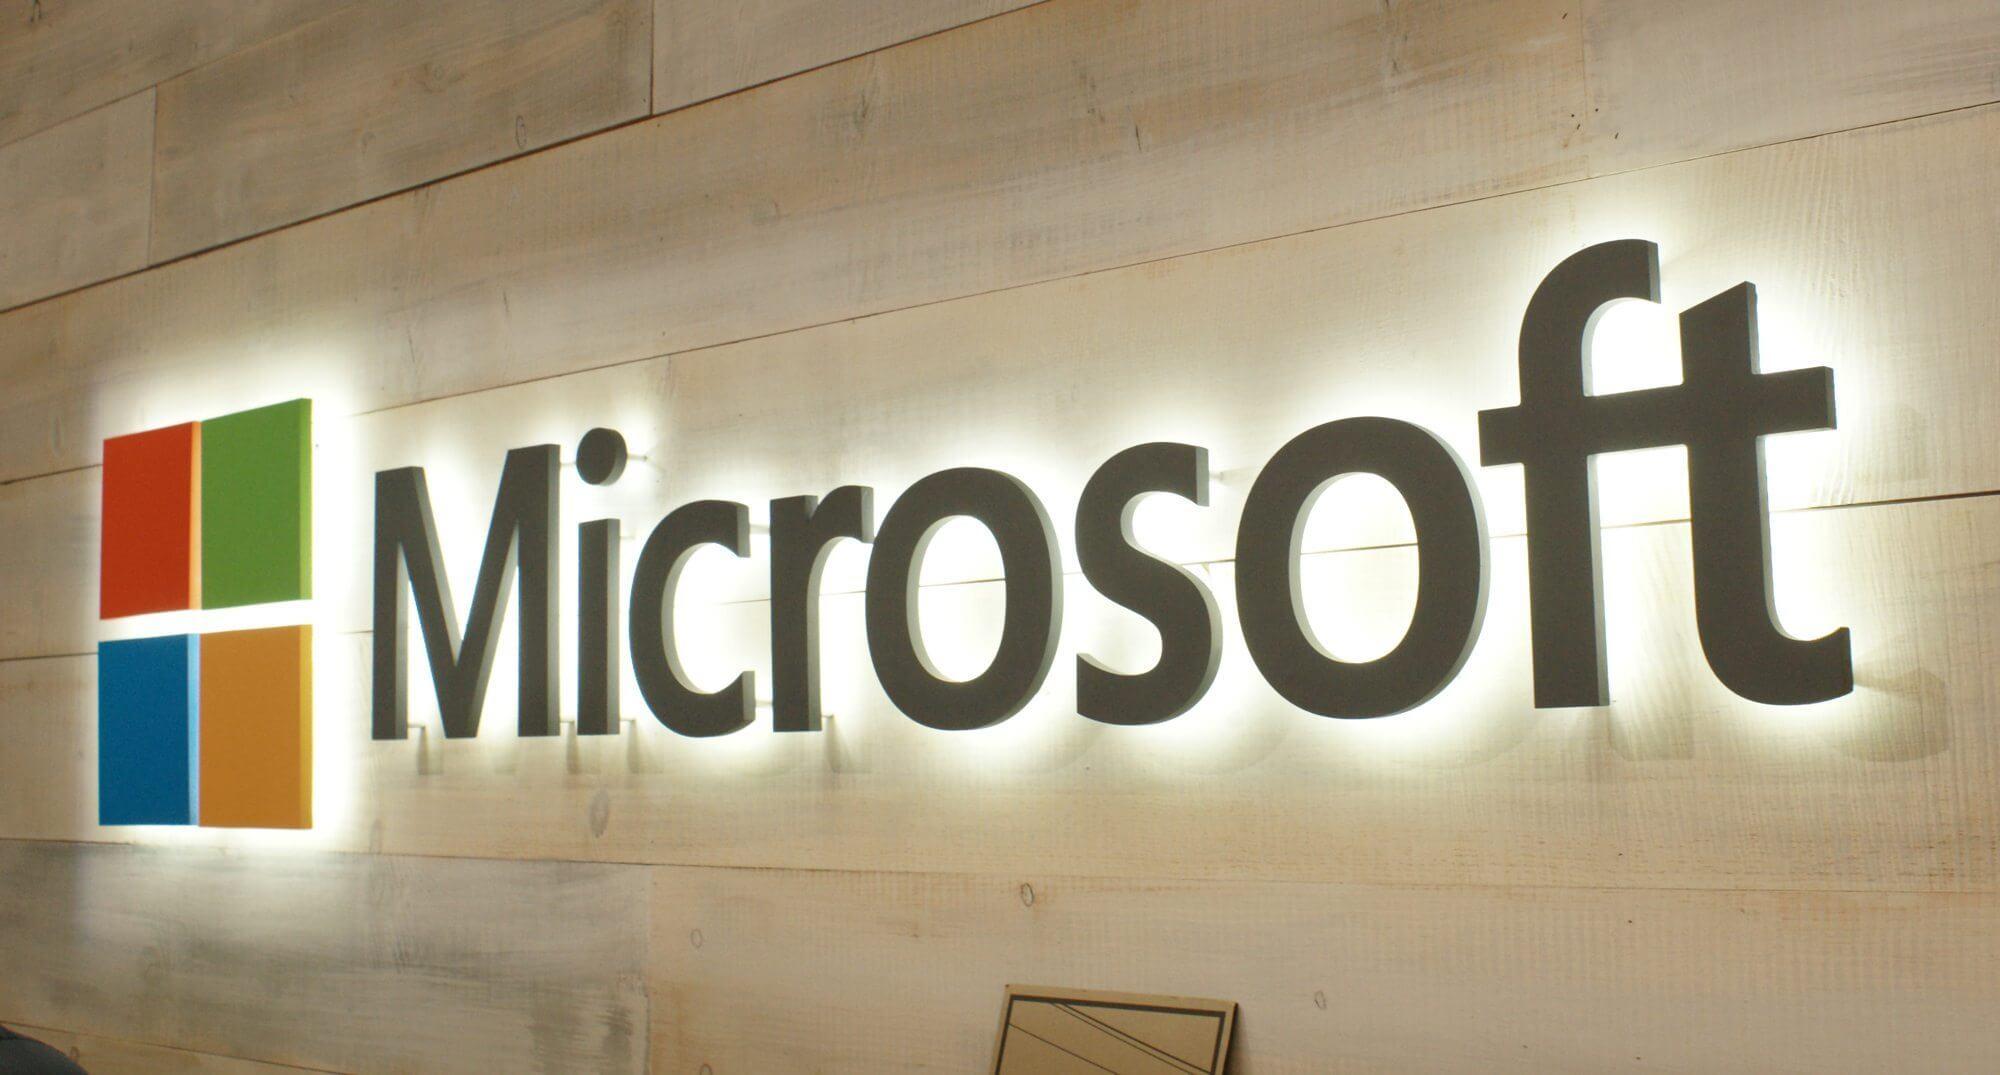 smt notemicrosoft p1 - Microsoft lança notebook exclusivo para consumidores brasileiros